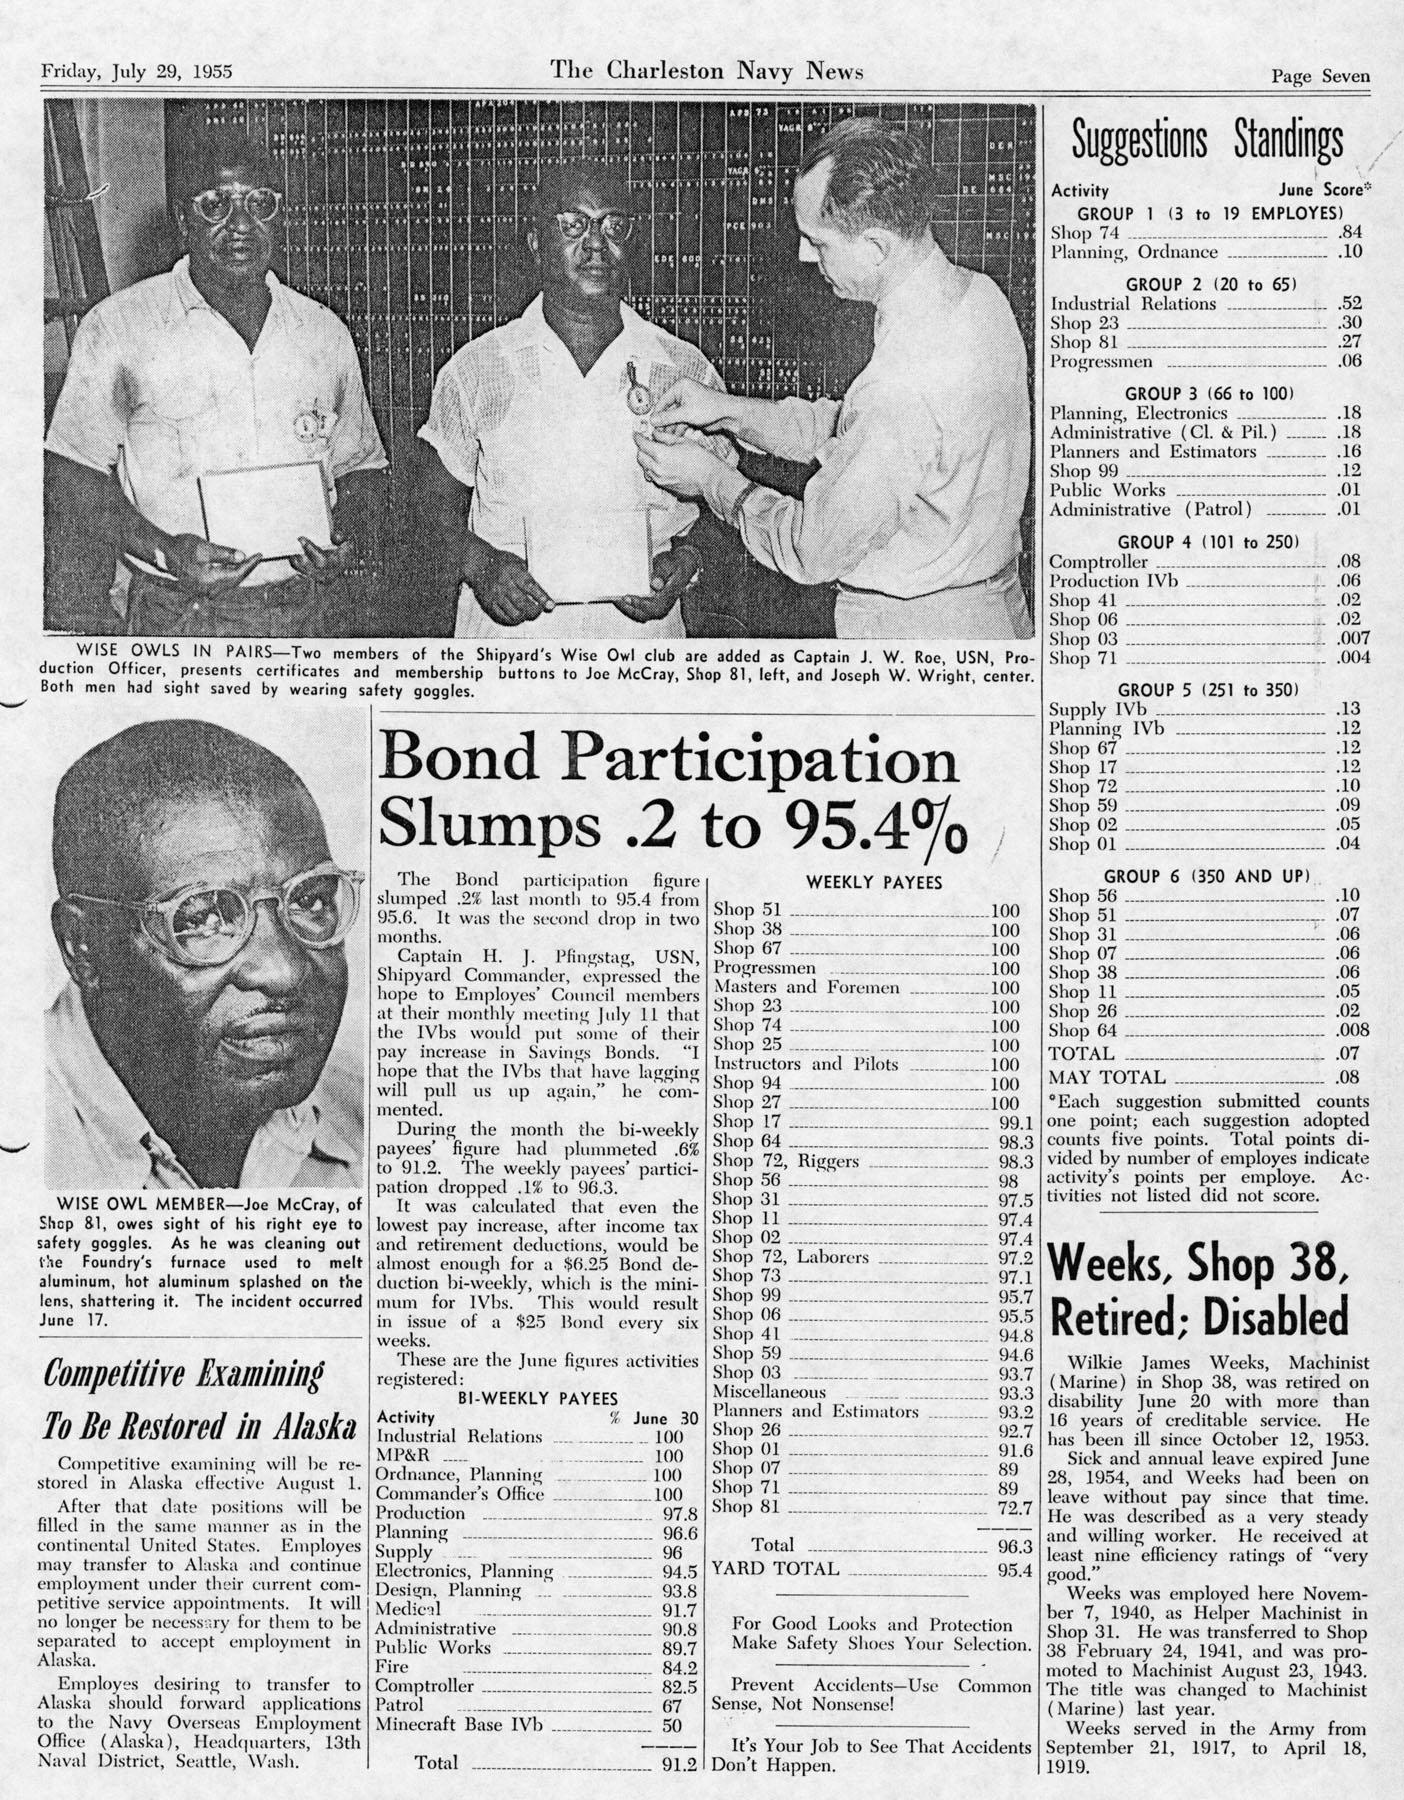 The Charleston Navy News, Volume 14, Edition 1, page vii